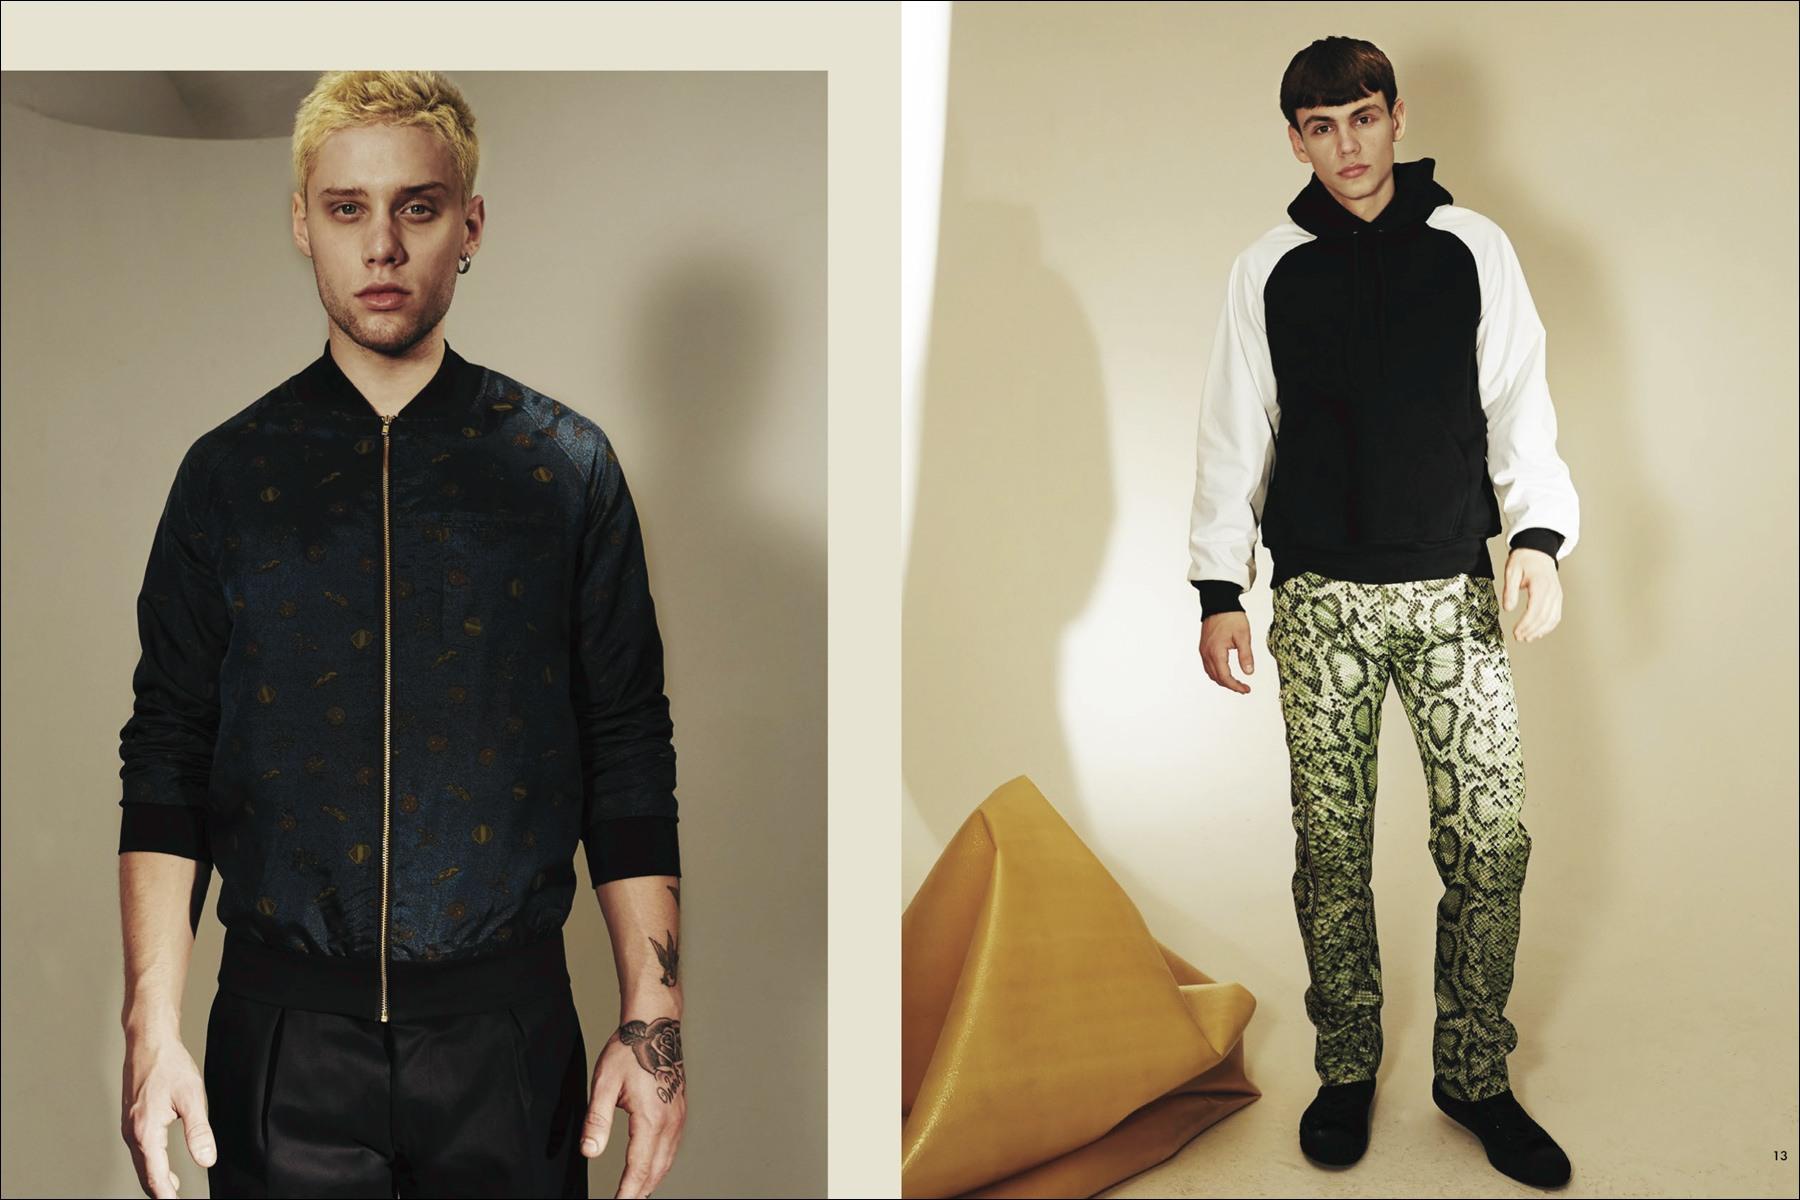 Male models Matt Assez and Matthew Logos photographed by Simon Cave for Martin Keehn F/W16 menswear lookbook. Ponyboy magazine NY.